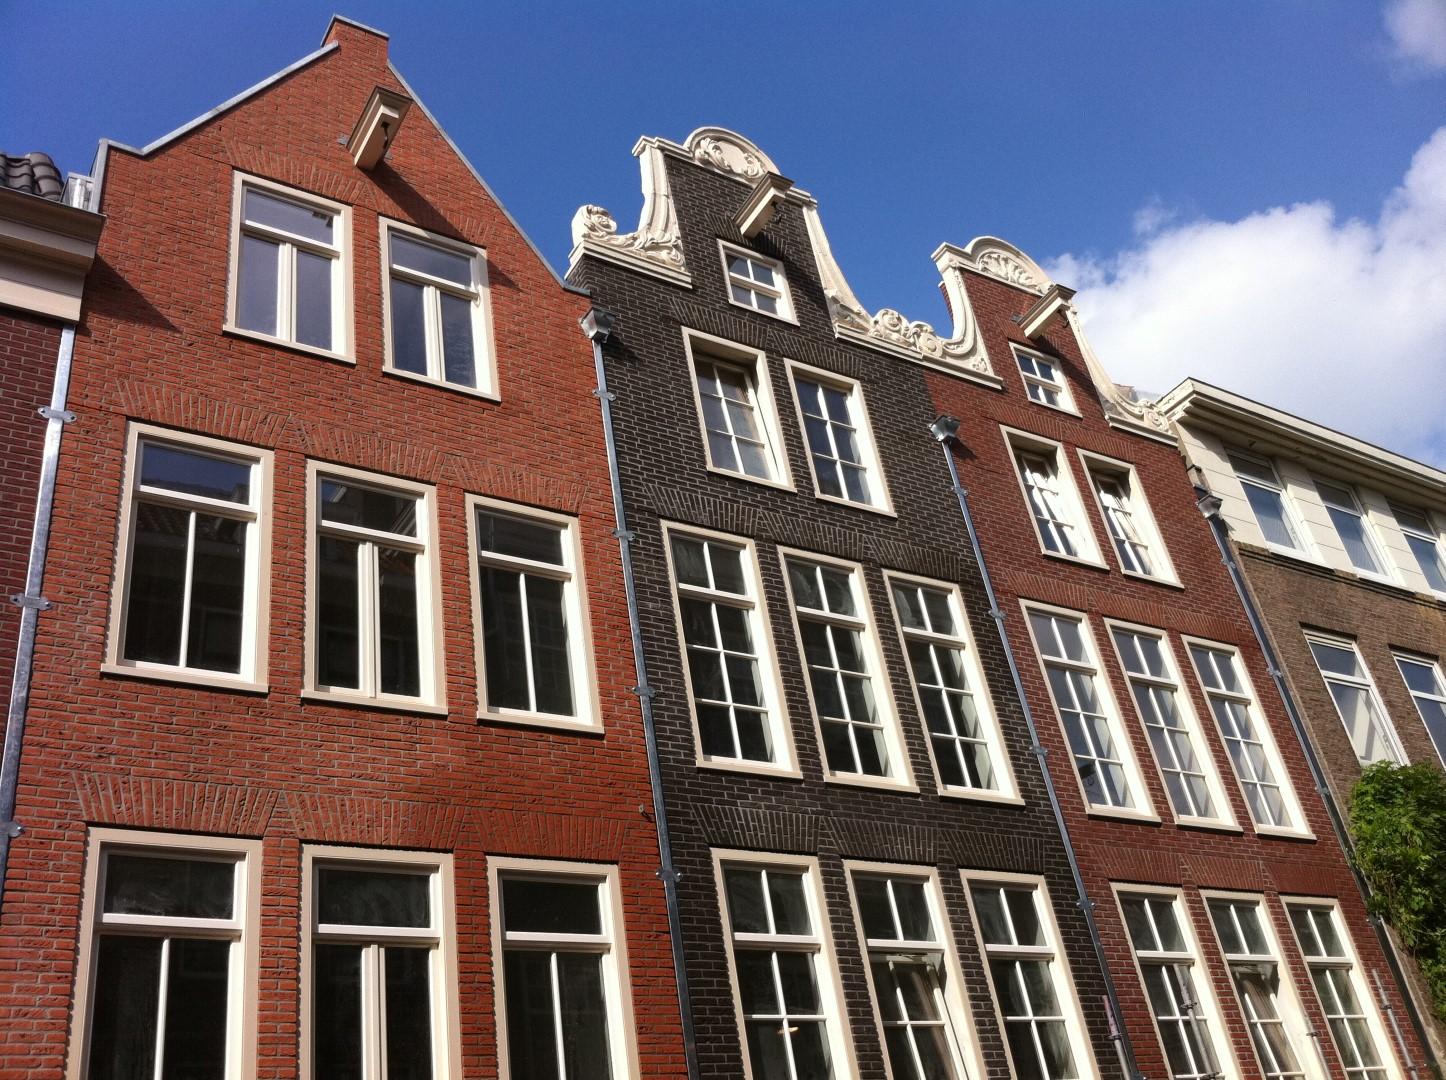 Rozengracht/Rozenstraat